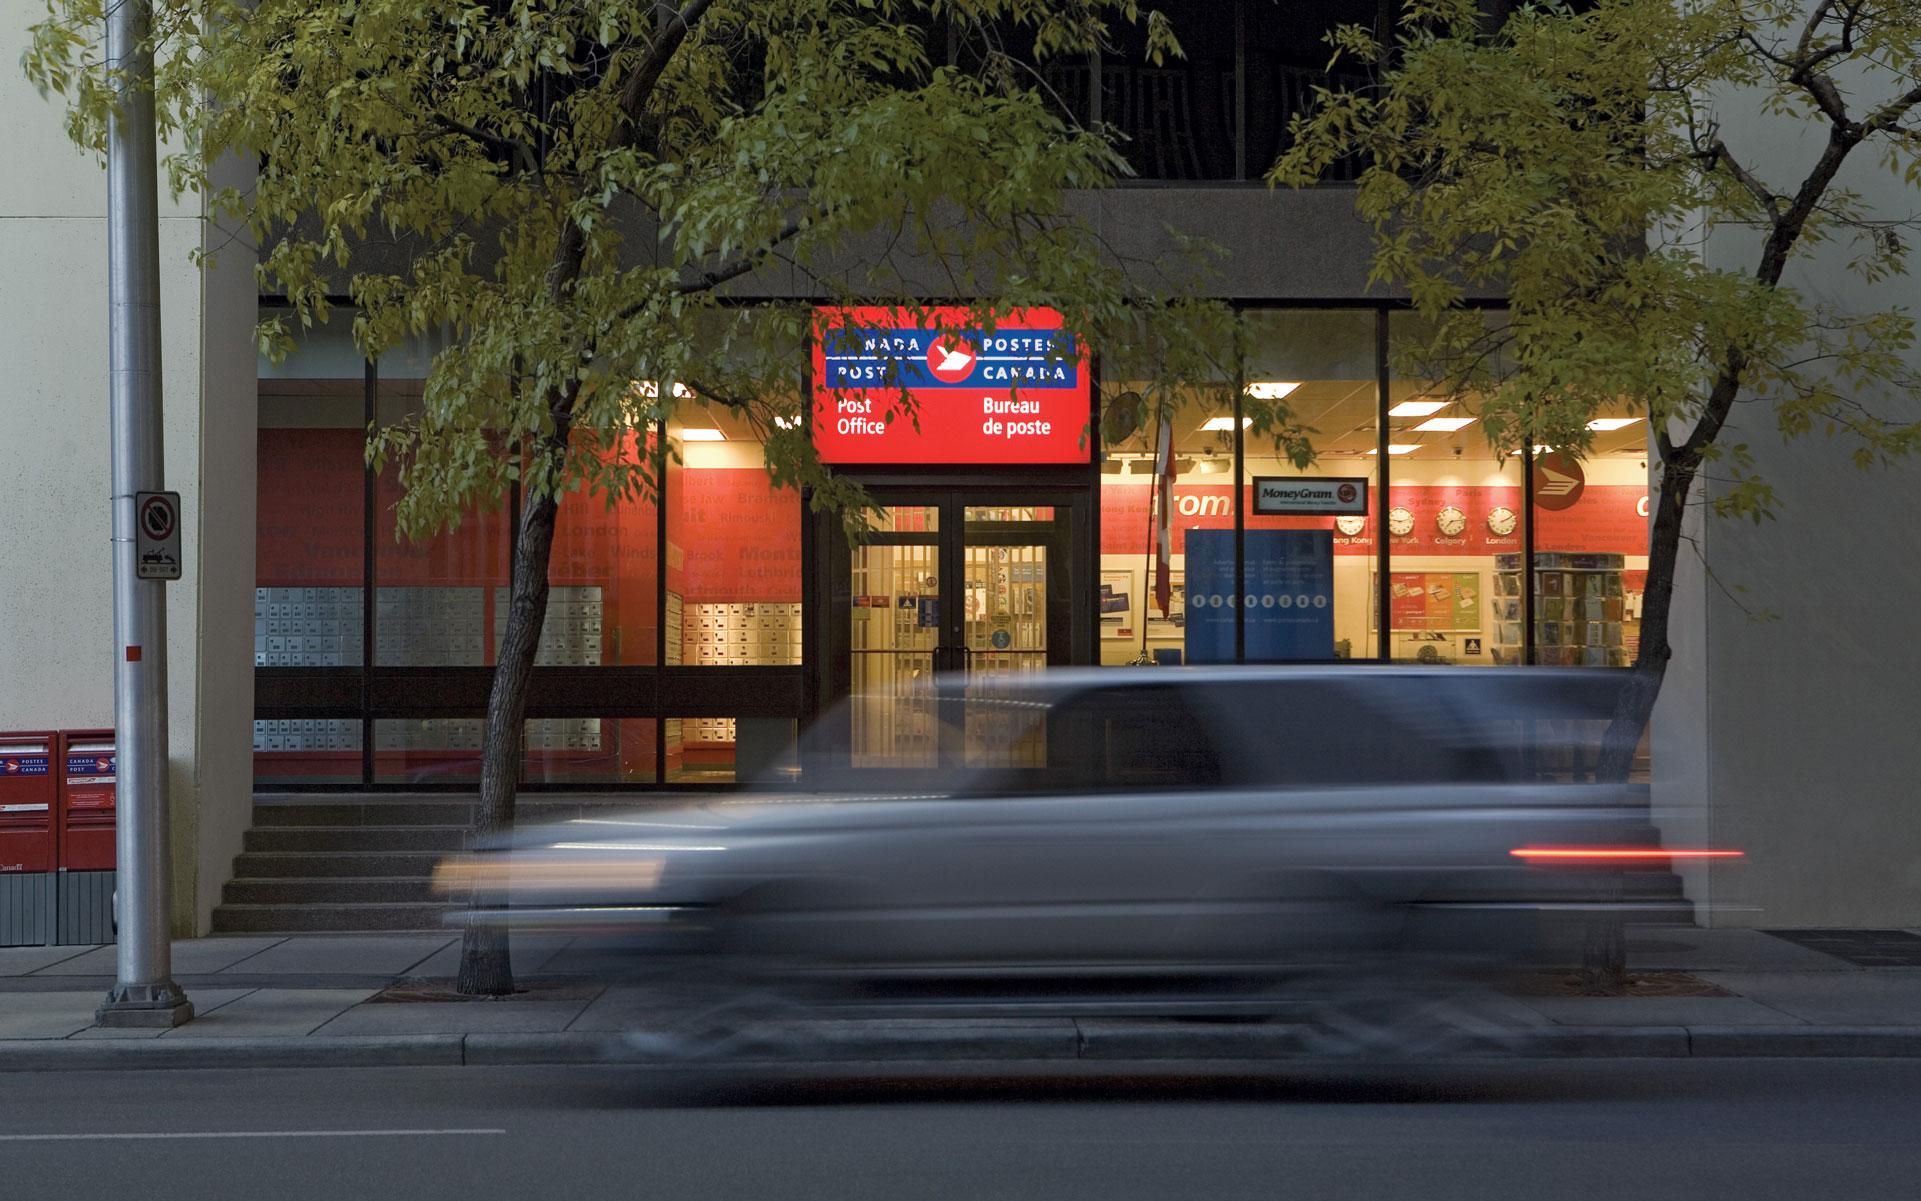 Canada post office; Canada Post marijuana delivery signature